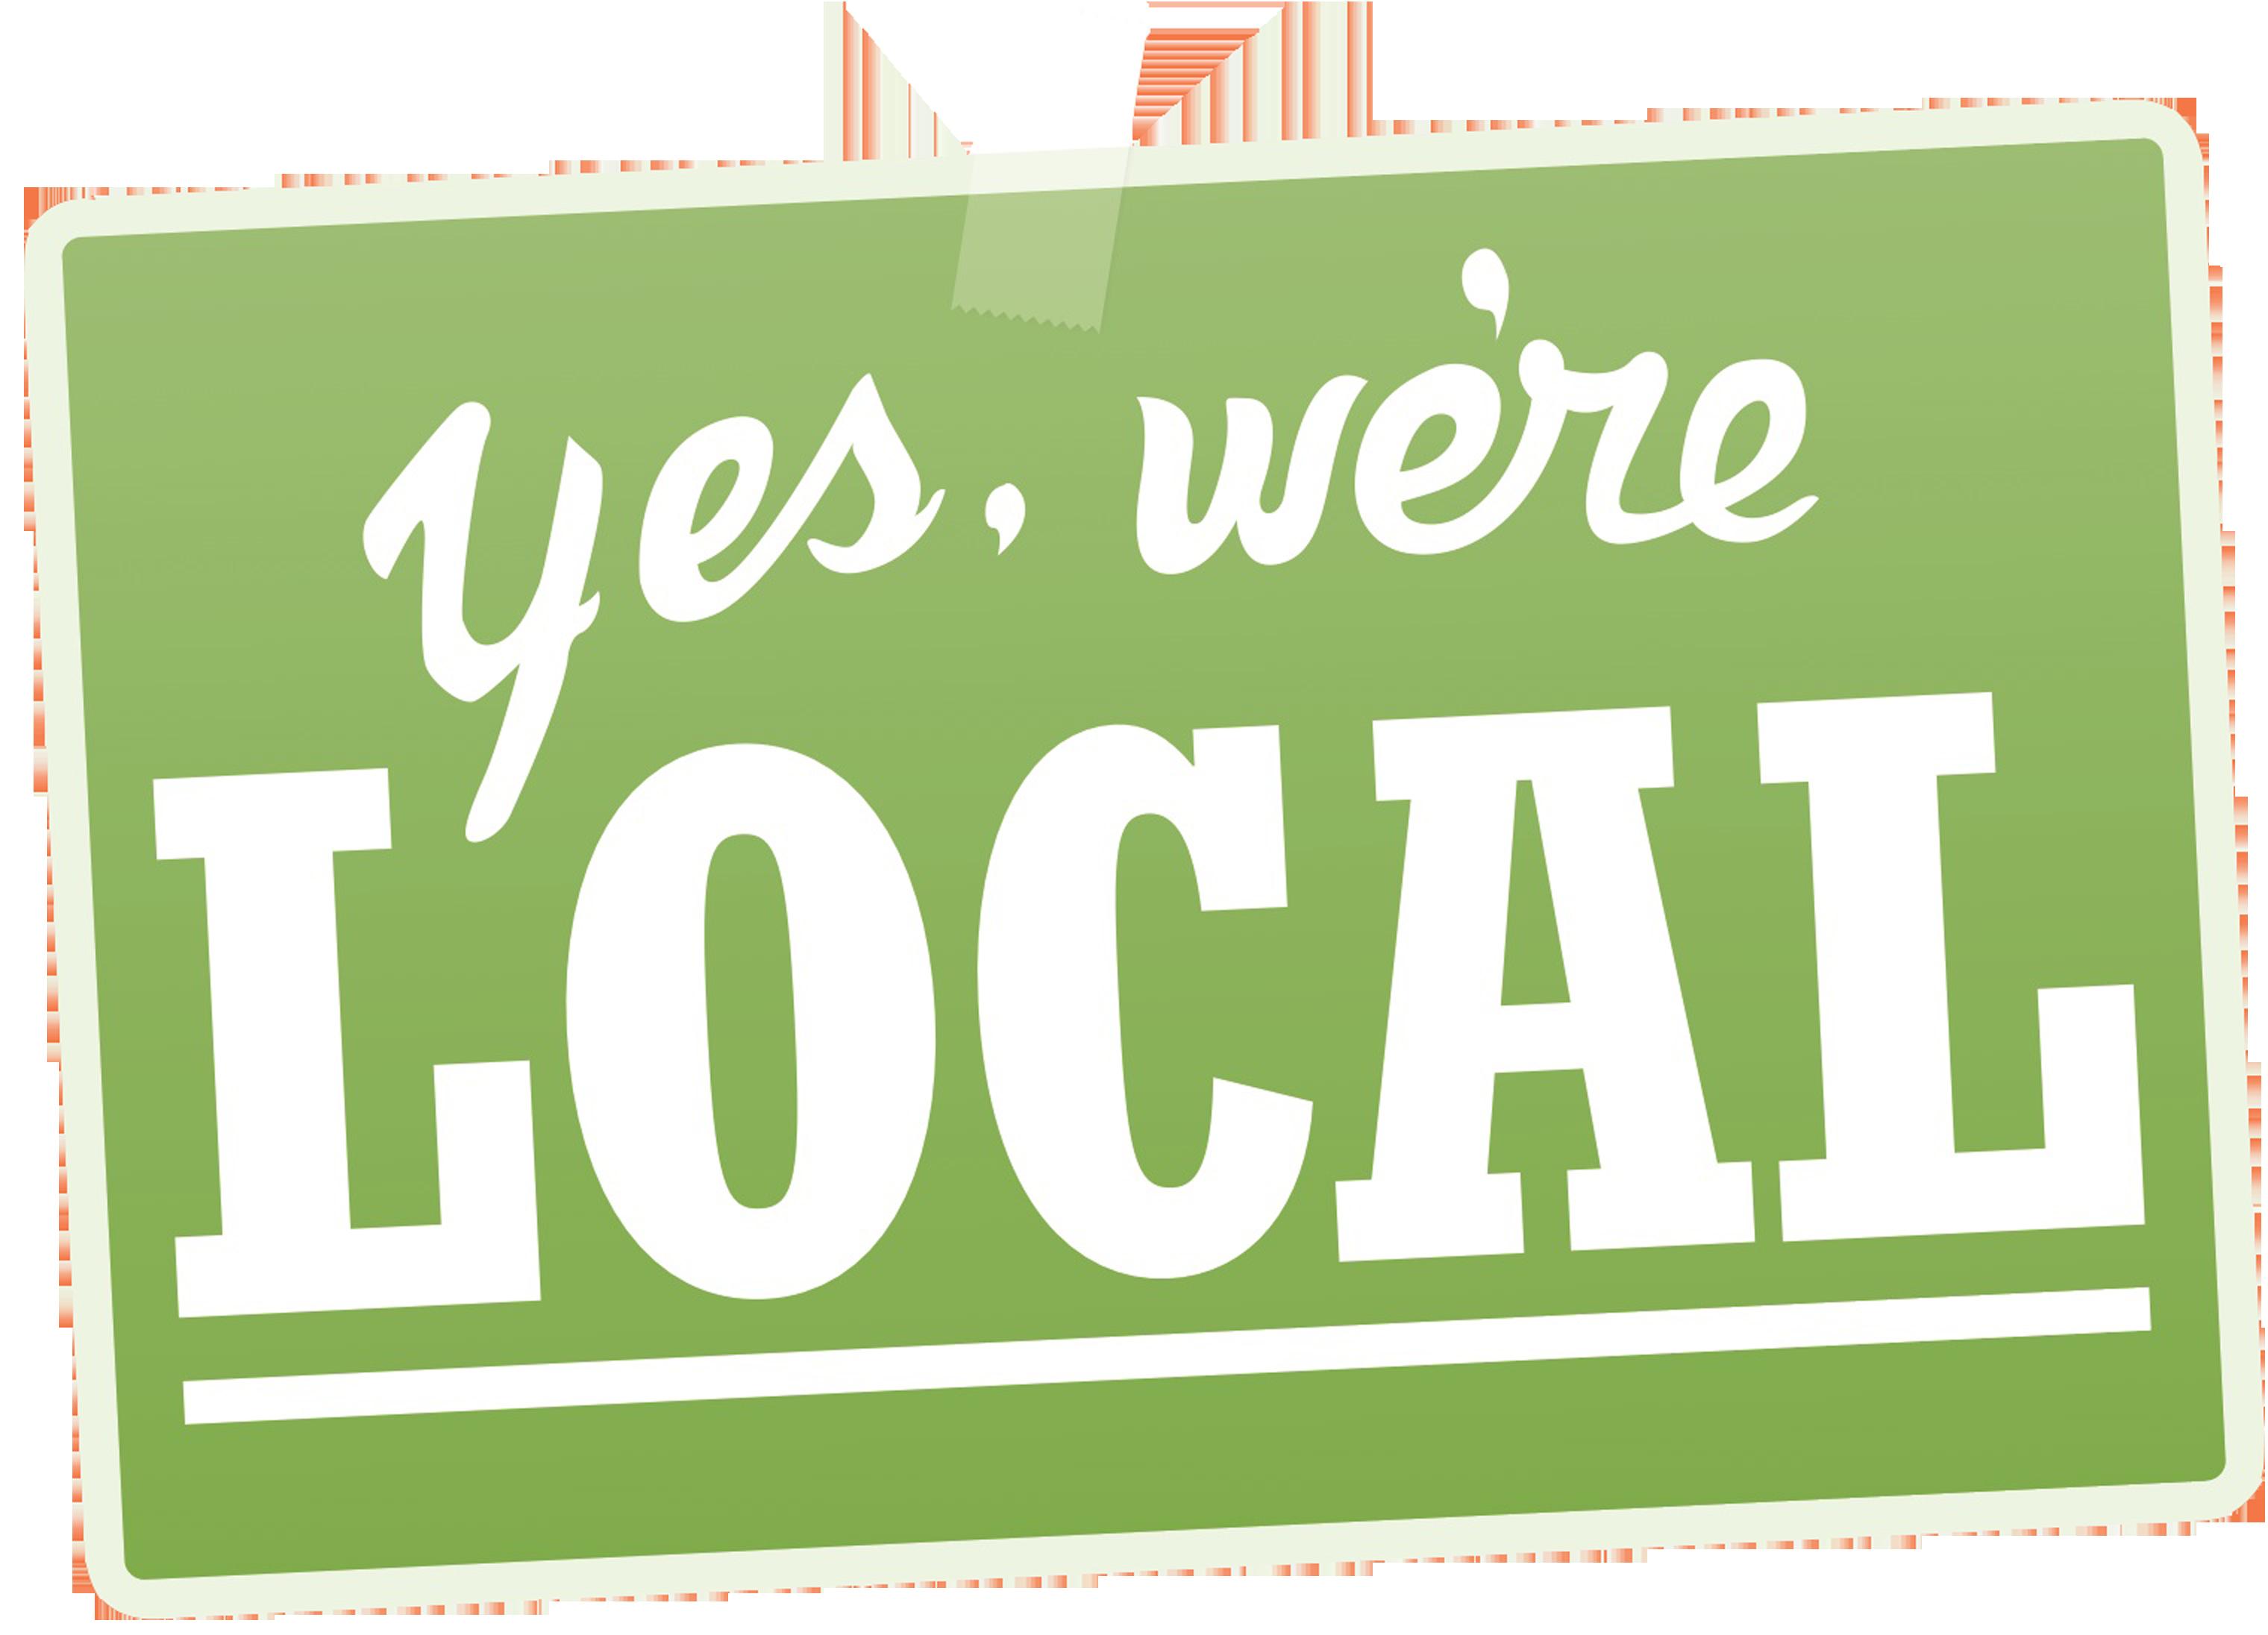 YesWereLocal-Houston-SEO-Website-Design-Service